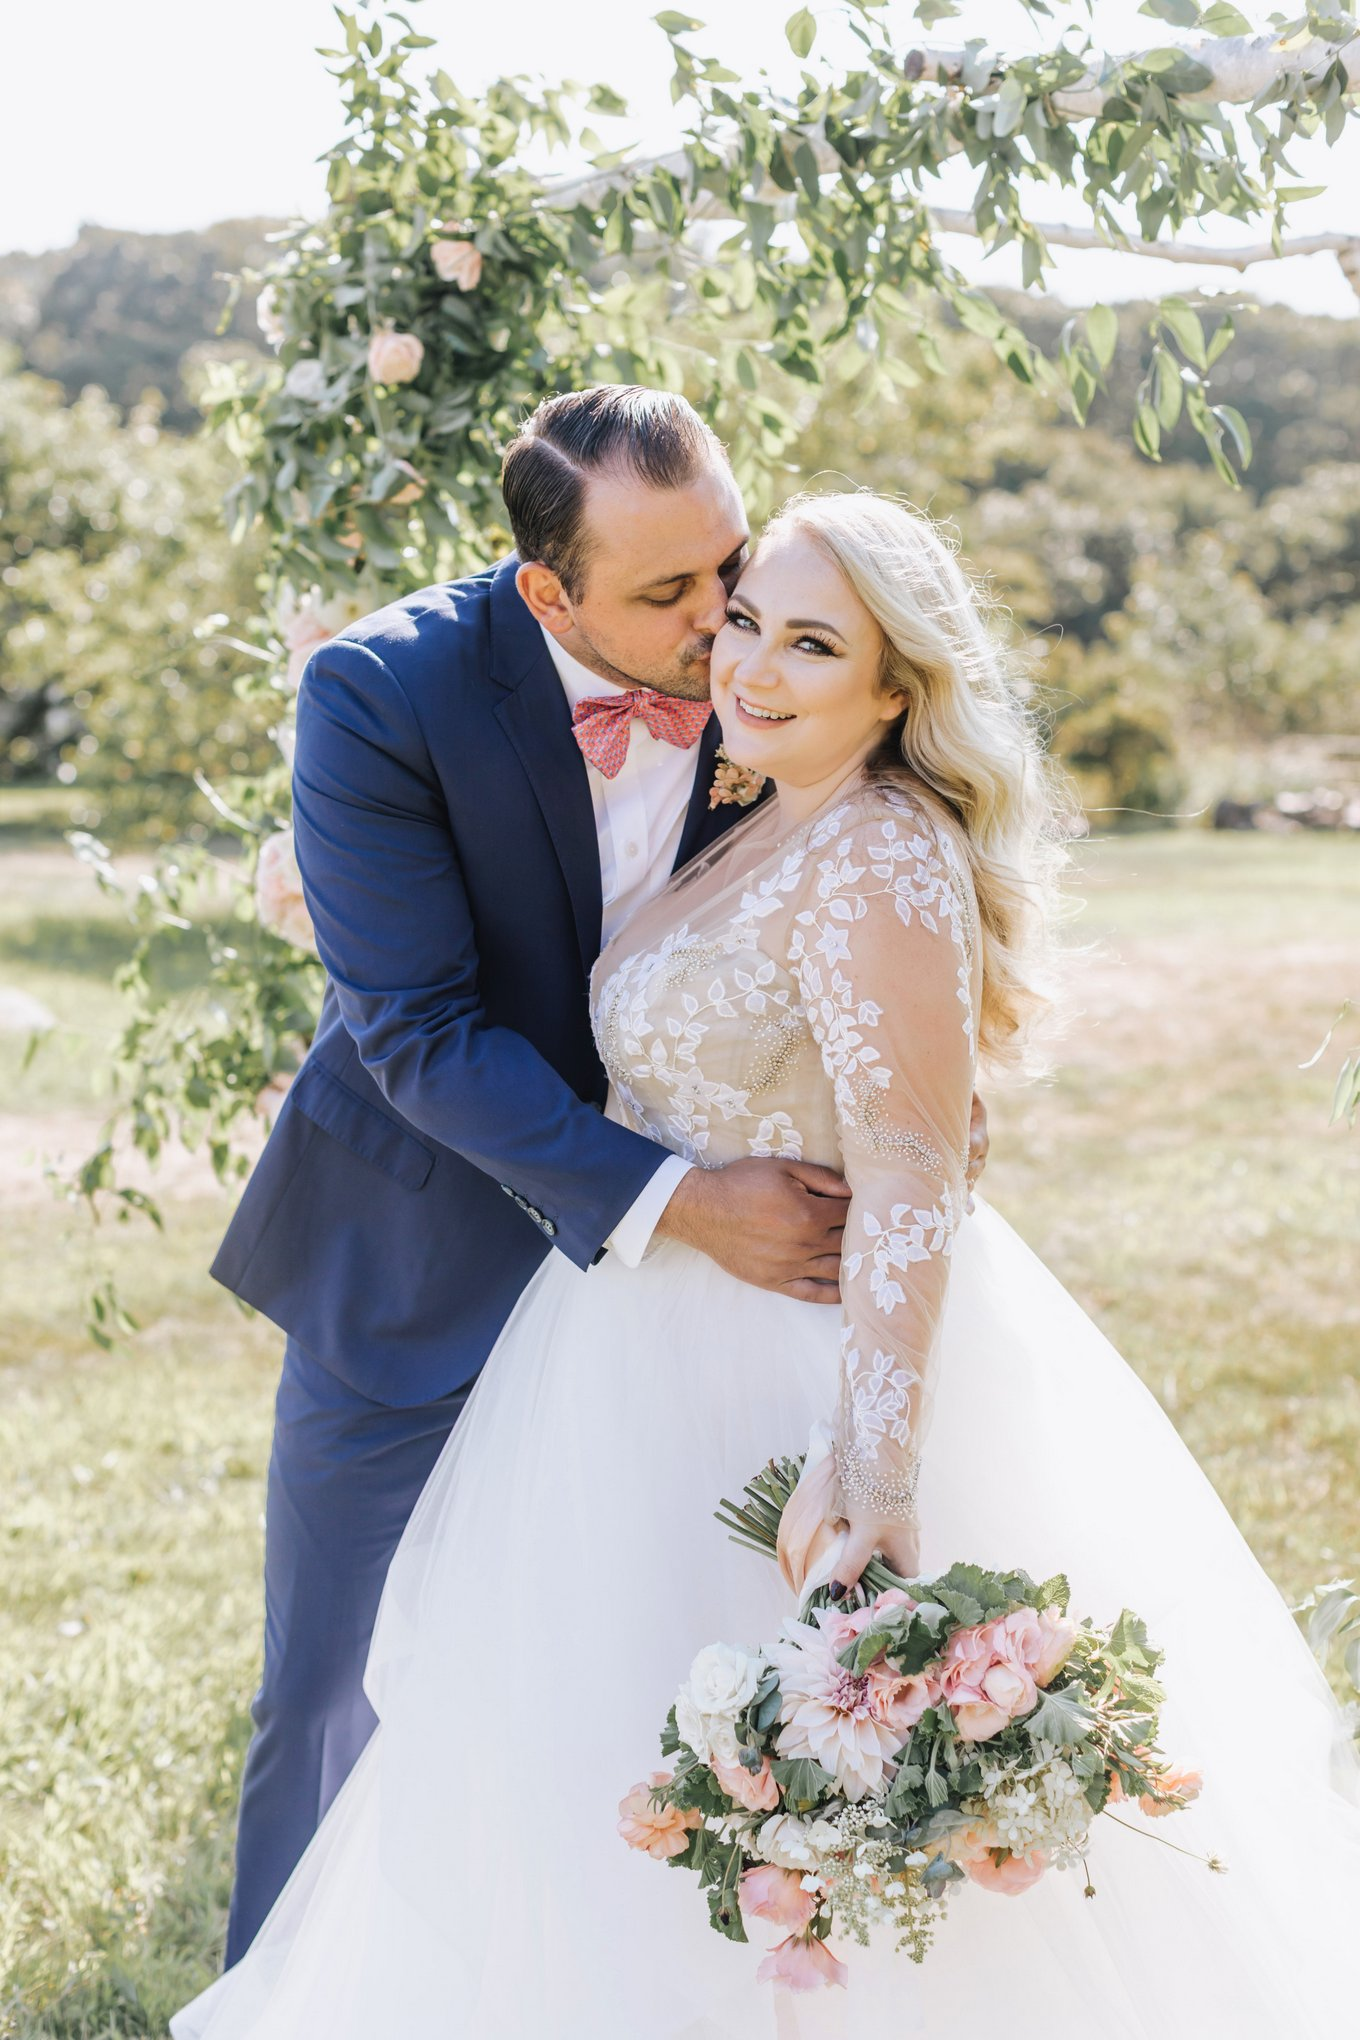 Marthas-Vineyard-Wedding-Photographer-Beach-Plum-Inn-24.jpg